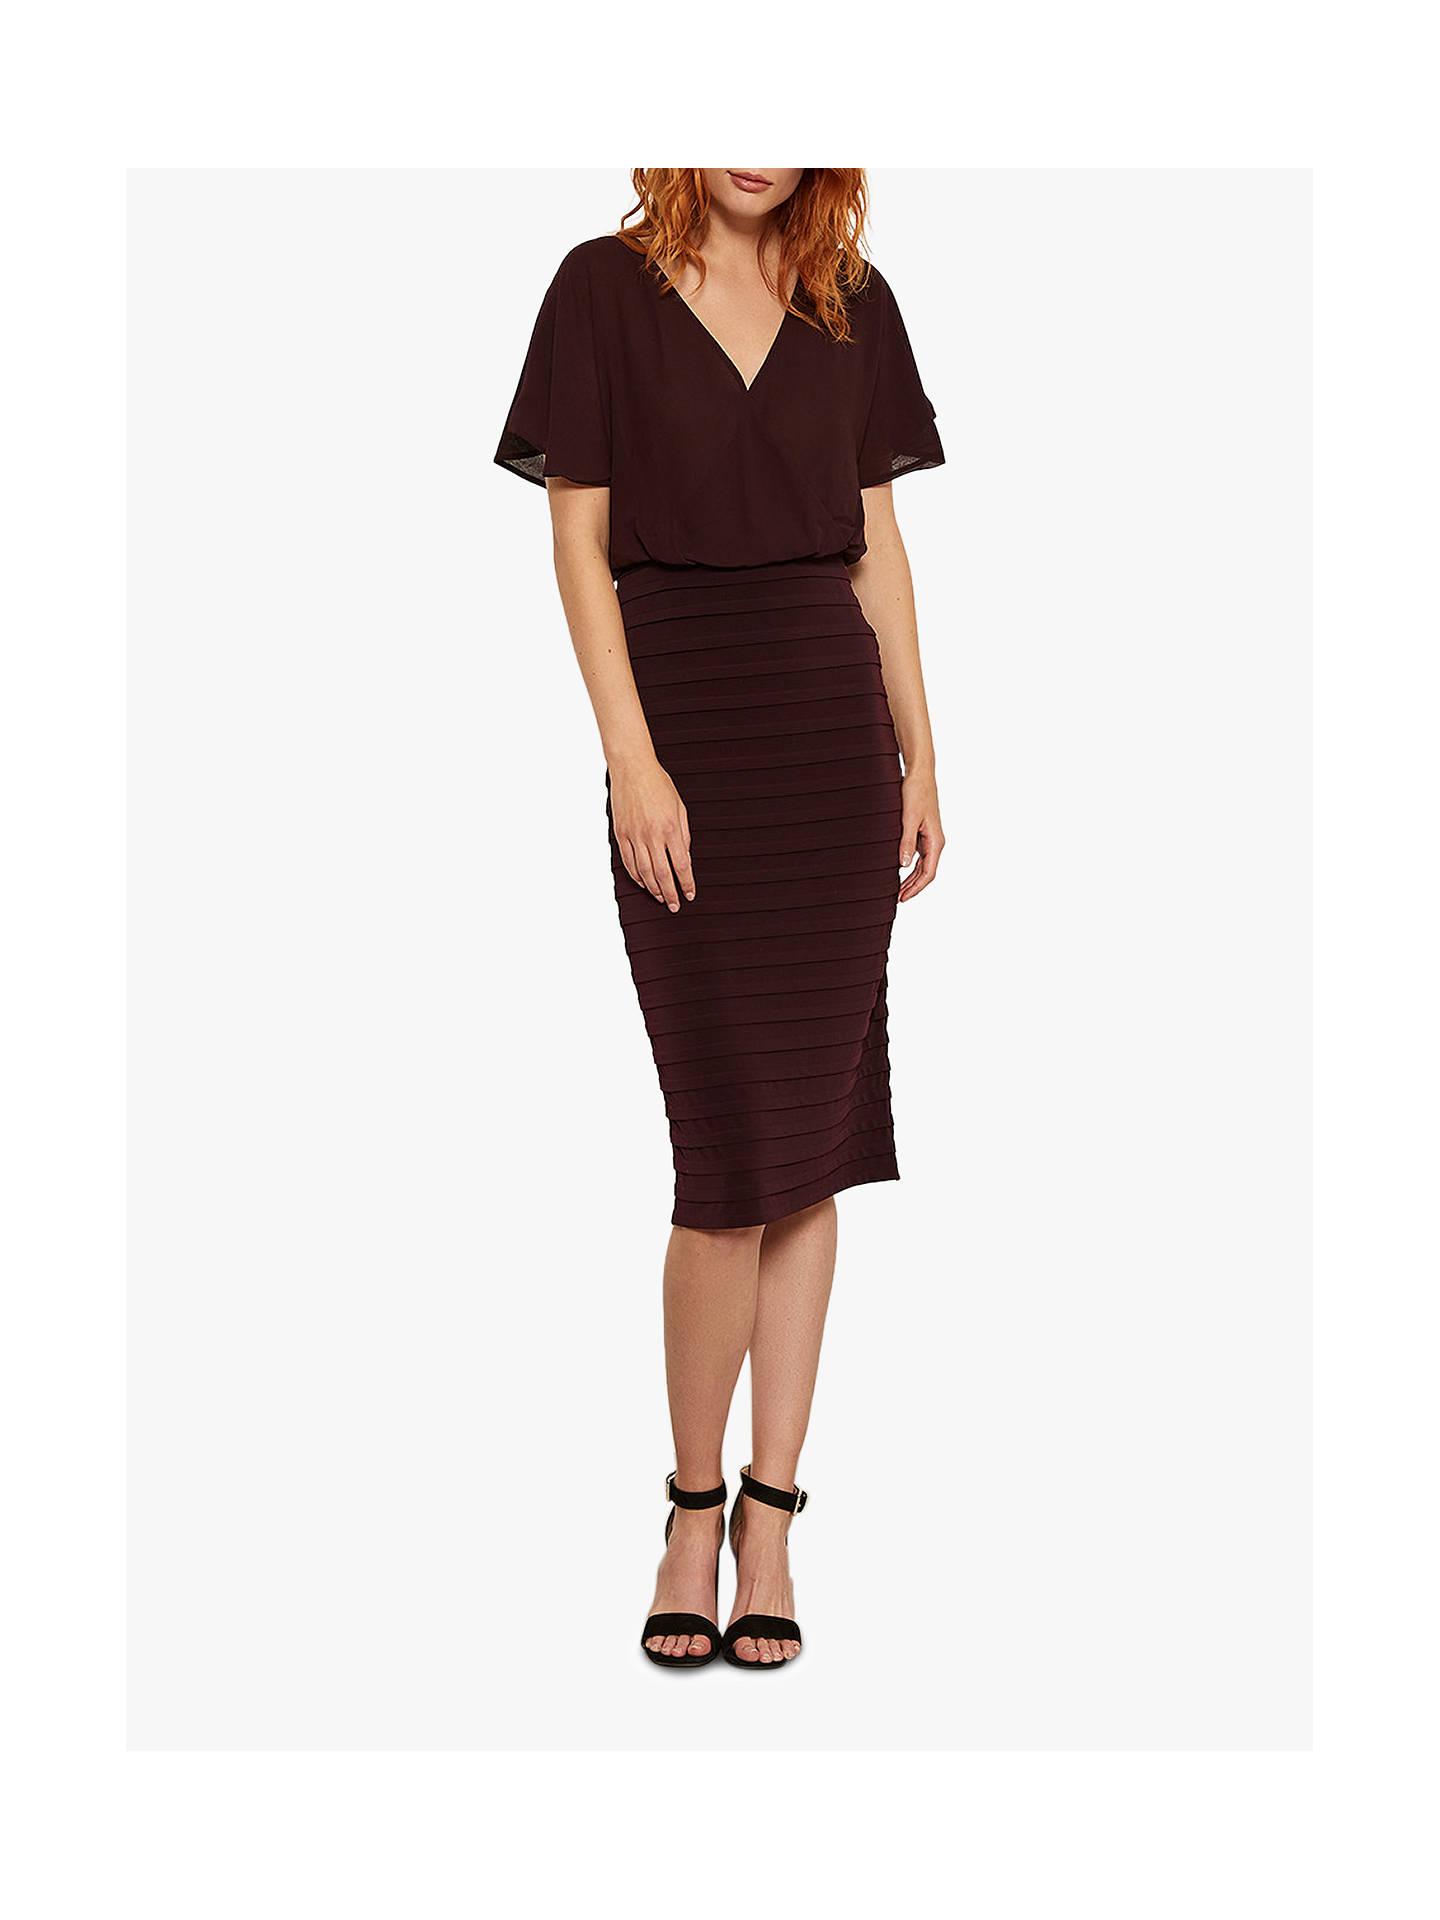 3986ec85137395 Buy Mint Velvet Chiffon Bordeaux Bandage Dress